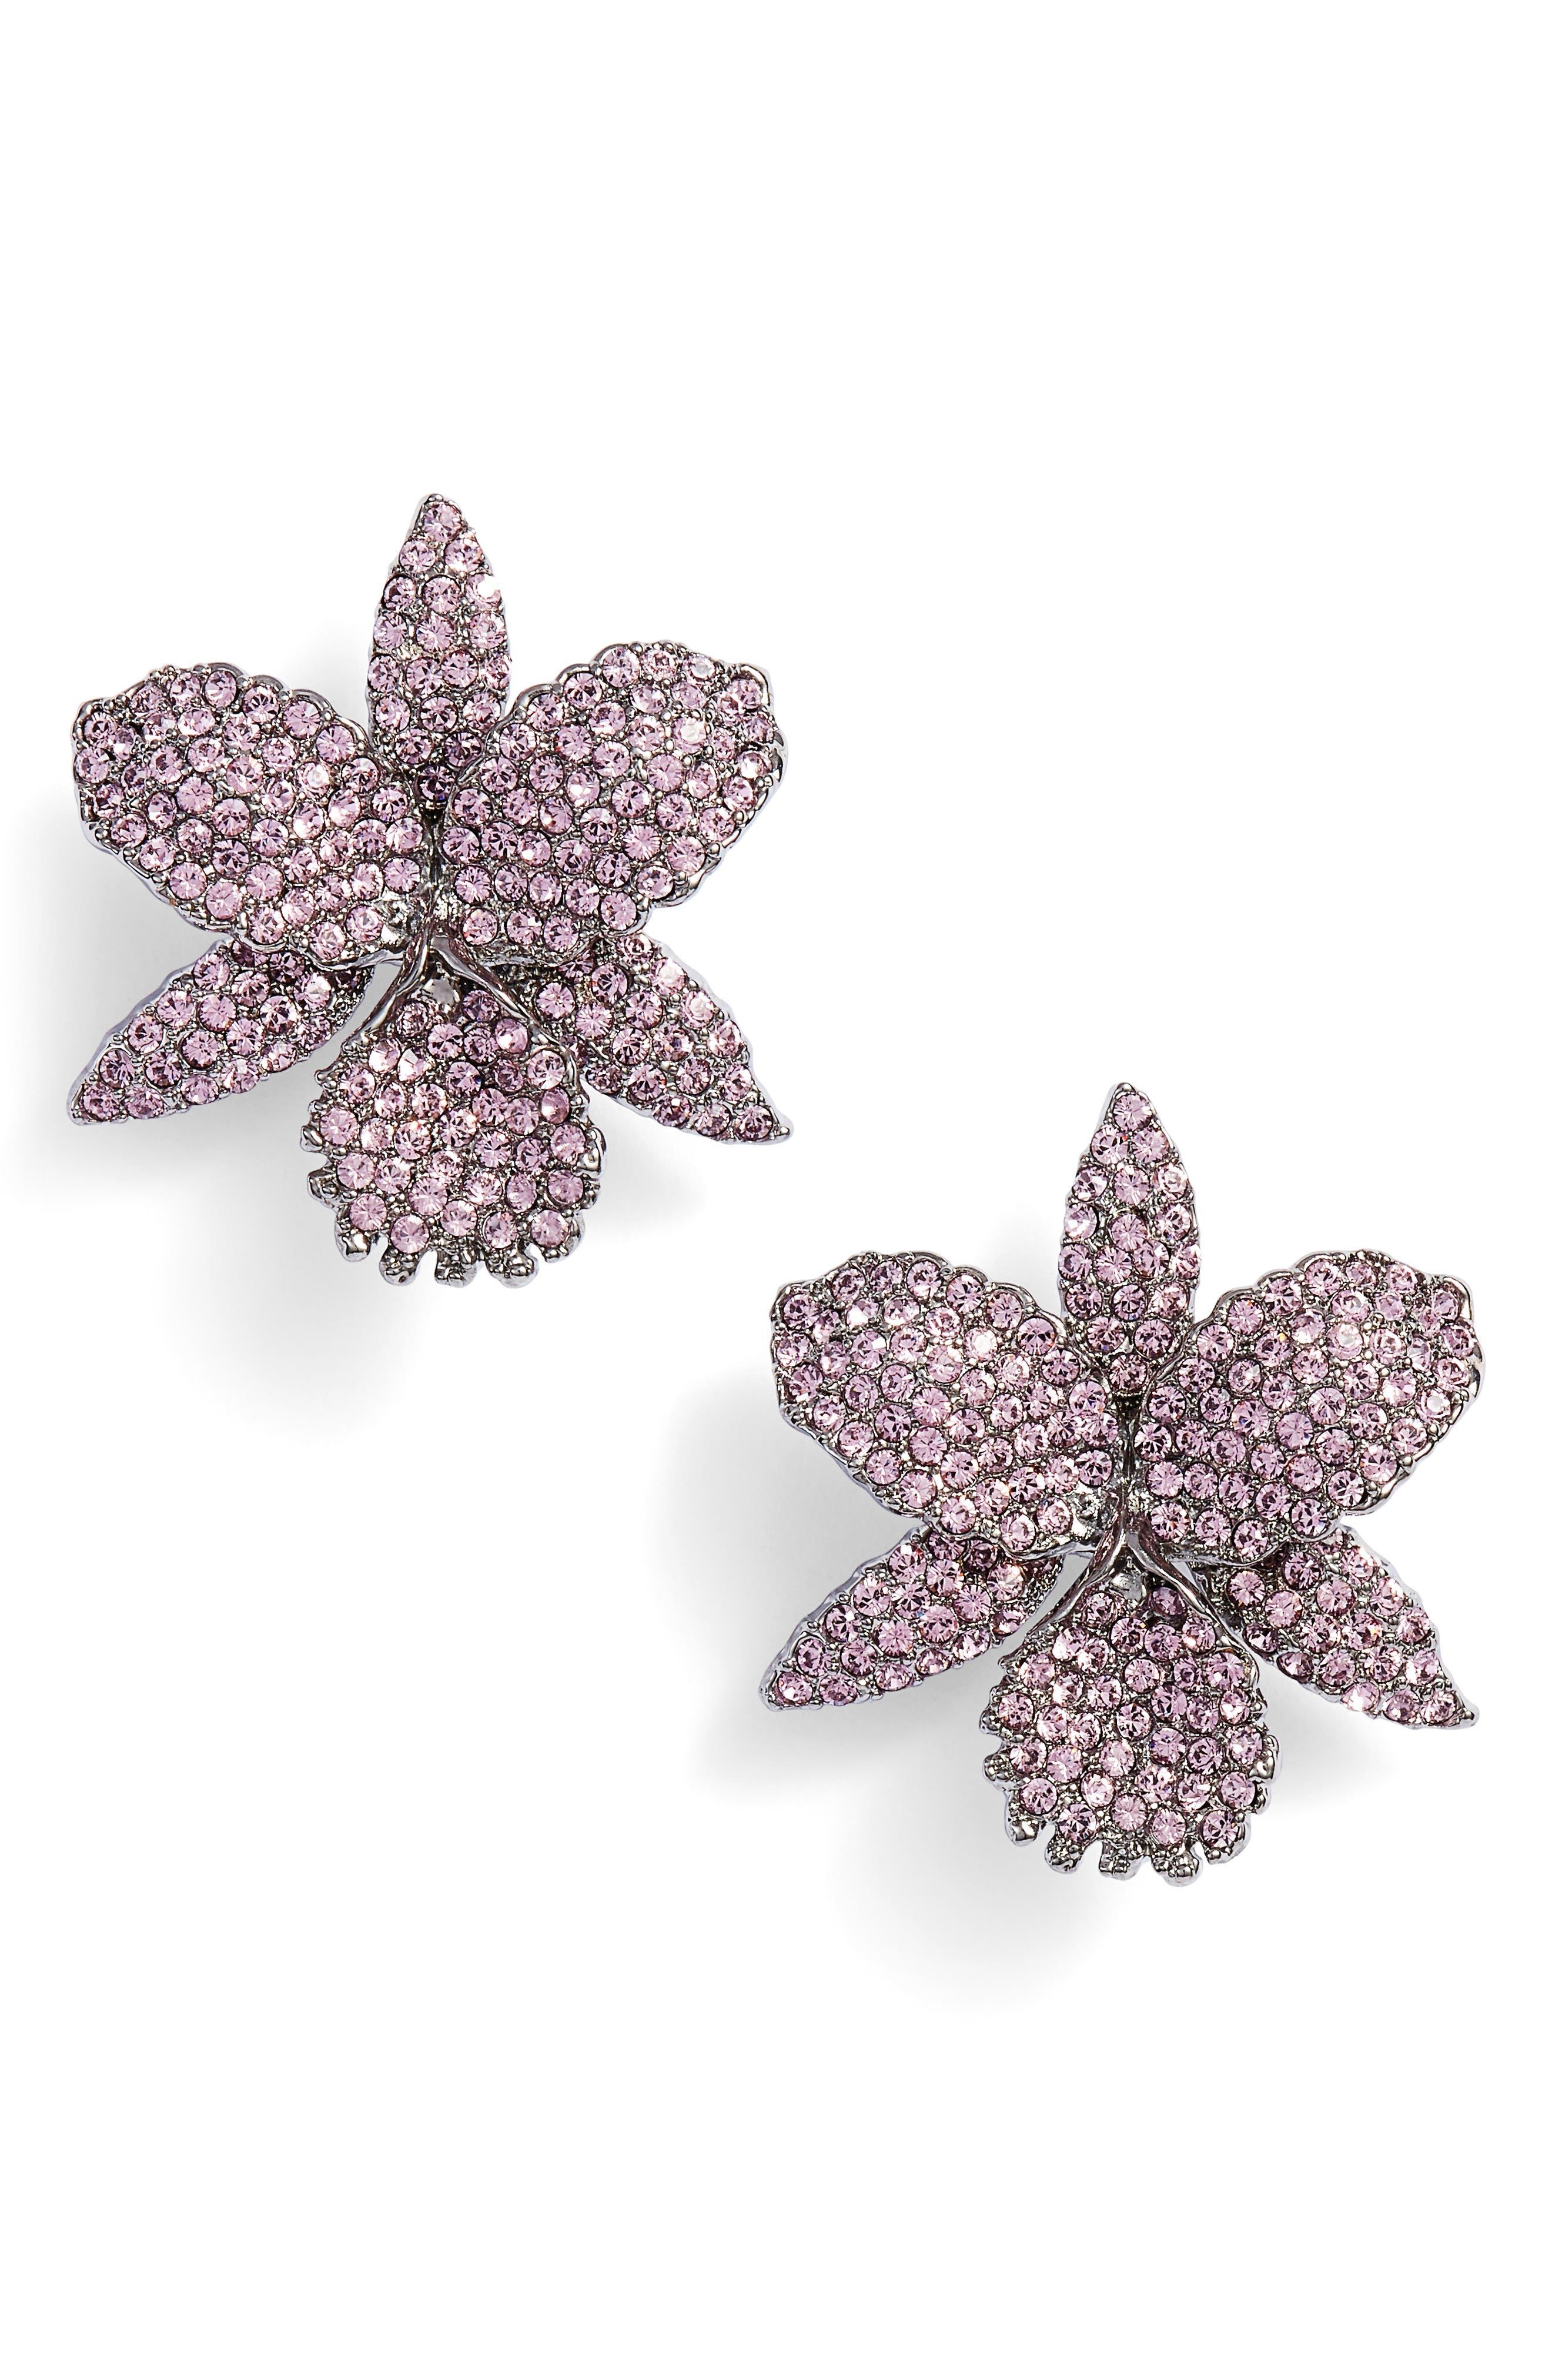 Large Orchid Swarovski Crystal Stud Earrings,                             Main thumbnail 1, color,                             BLACK/ LIGHT AMETHYST